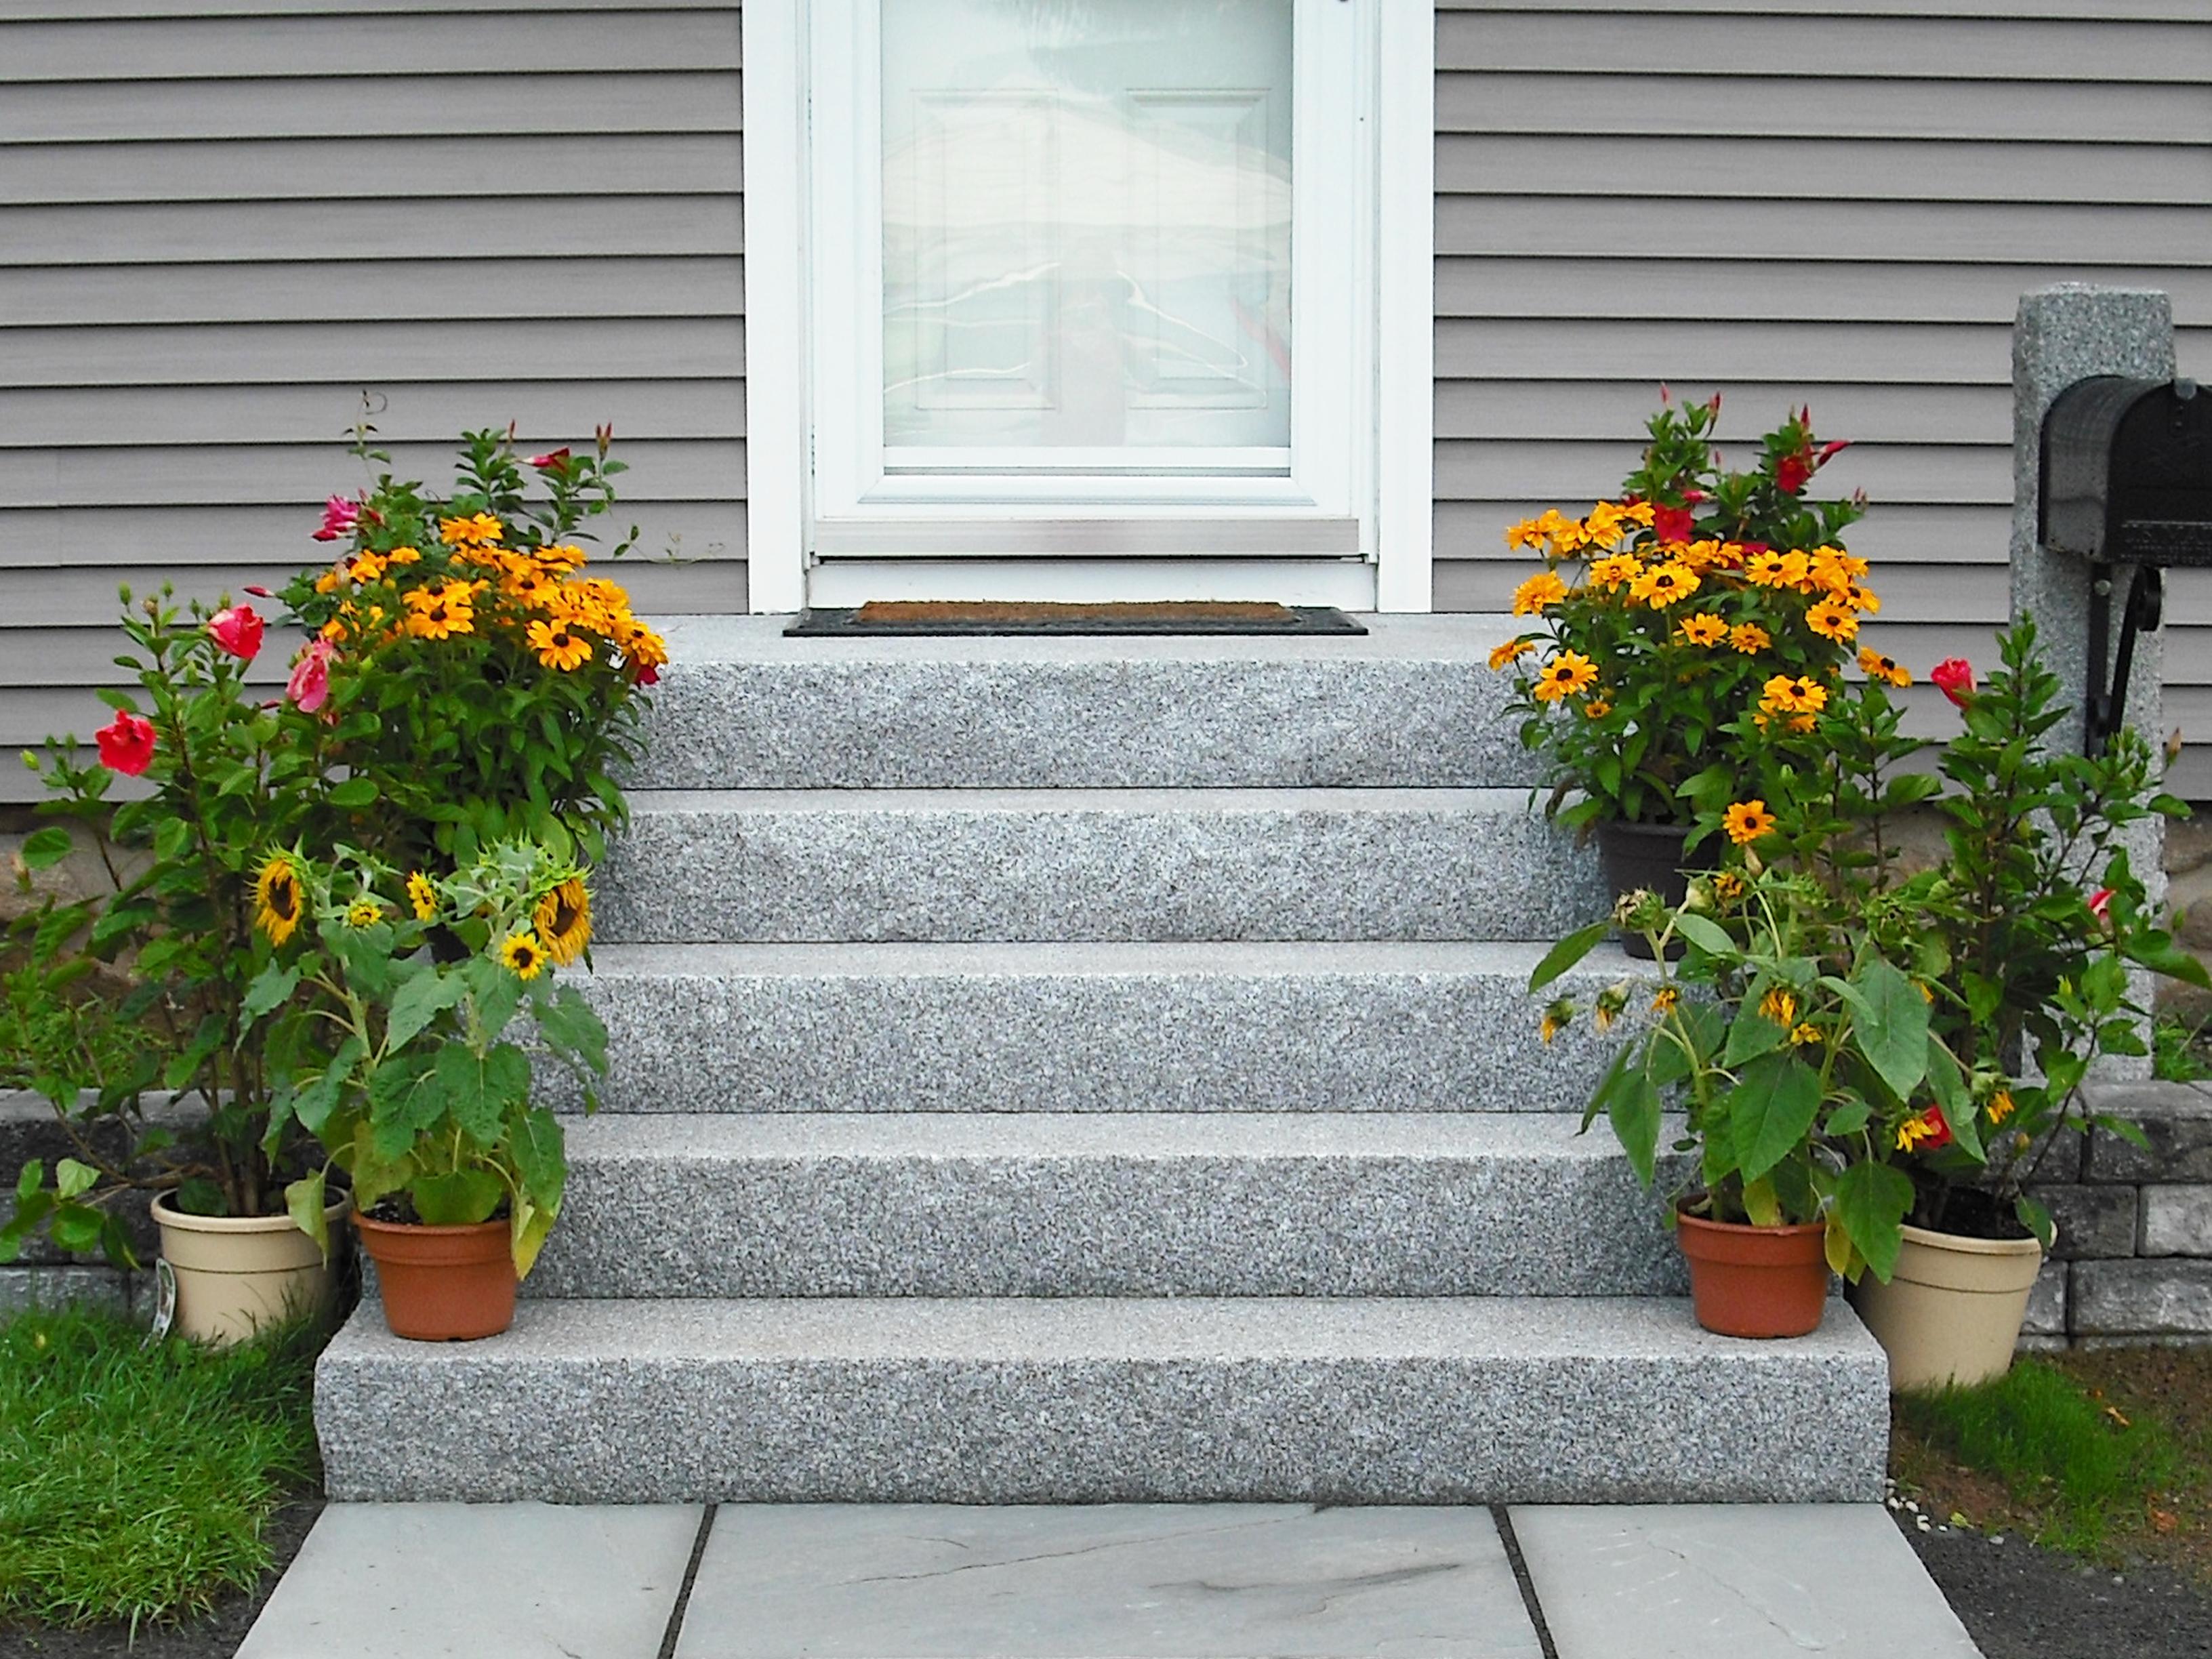 Woodbury Gray granite steps